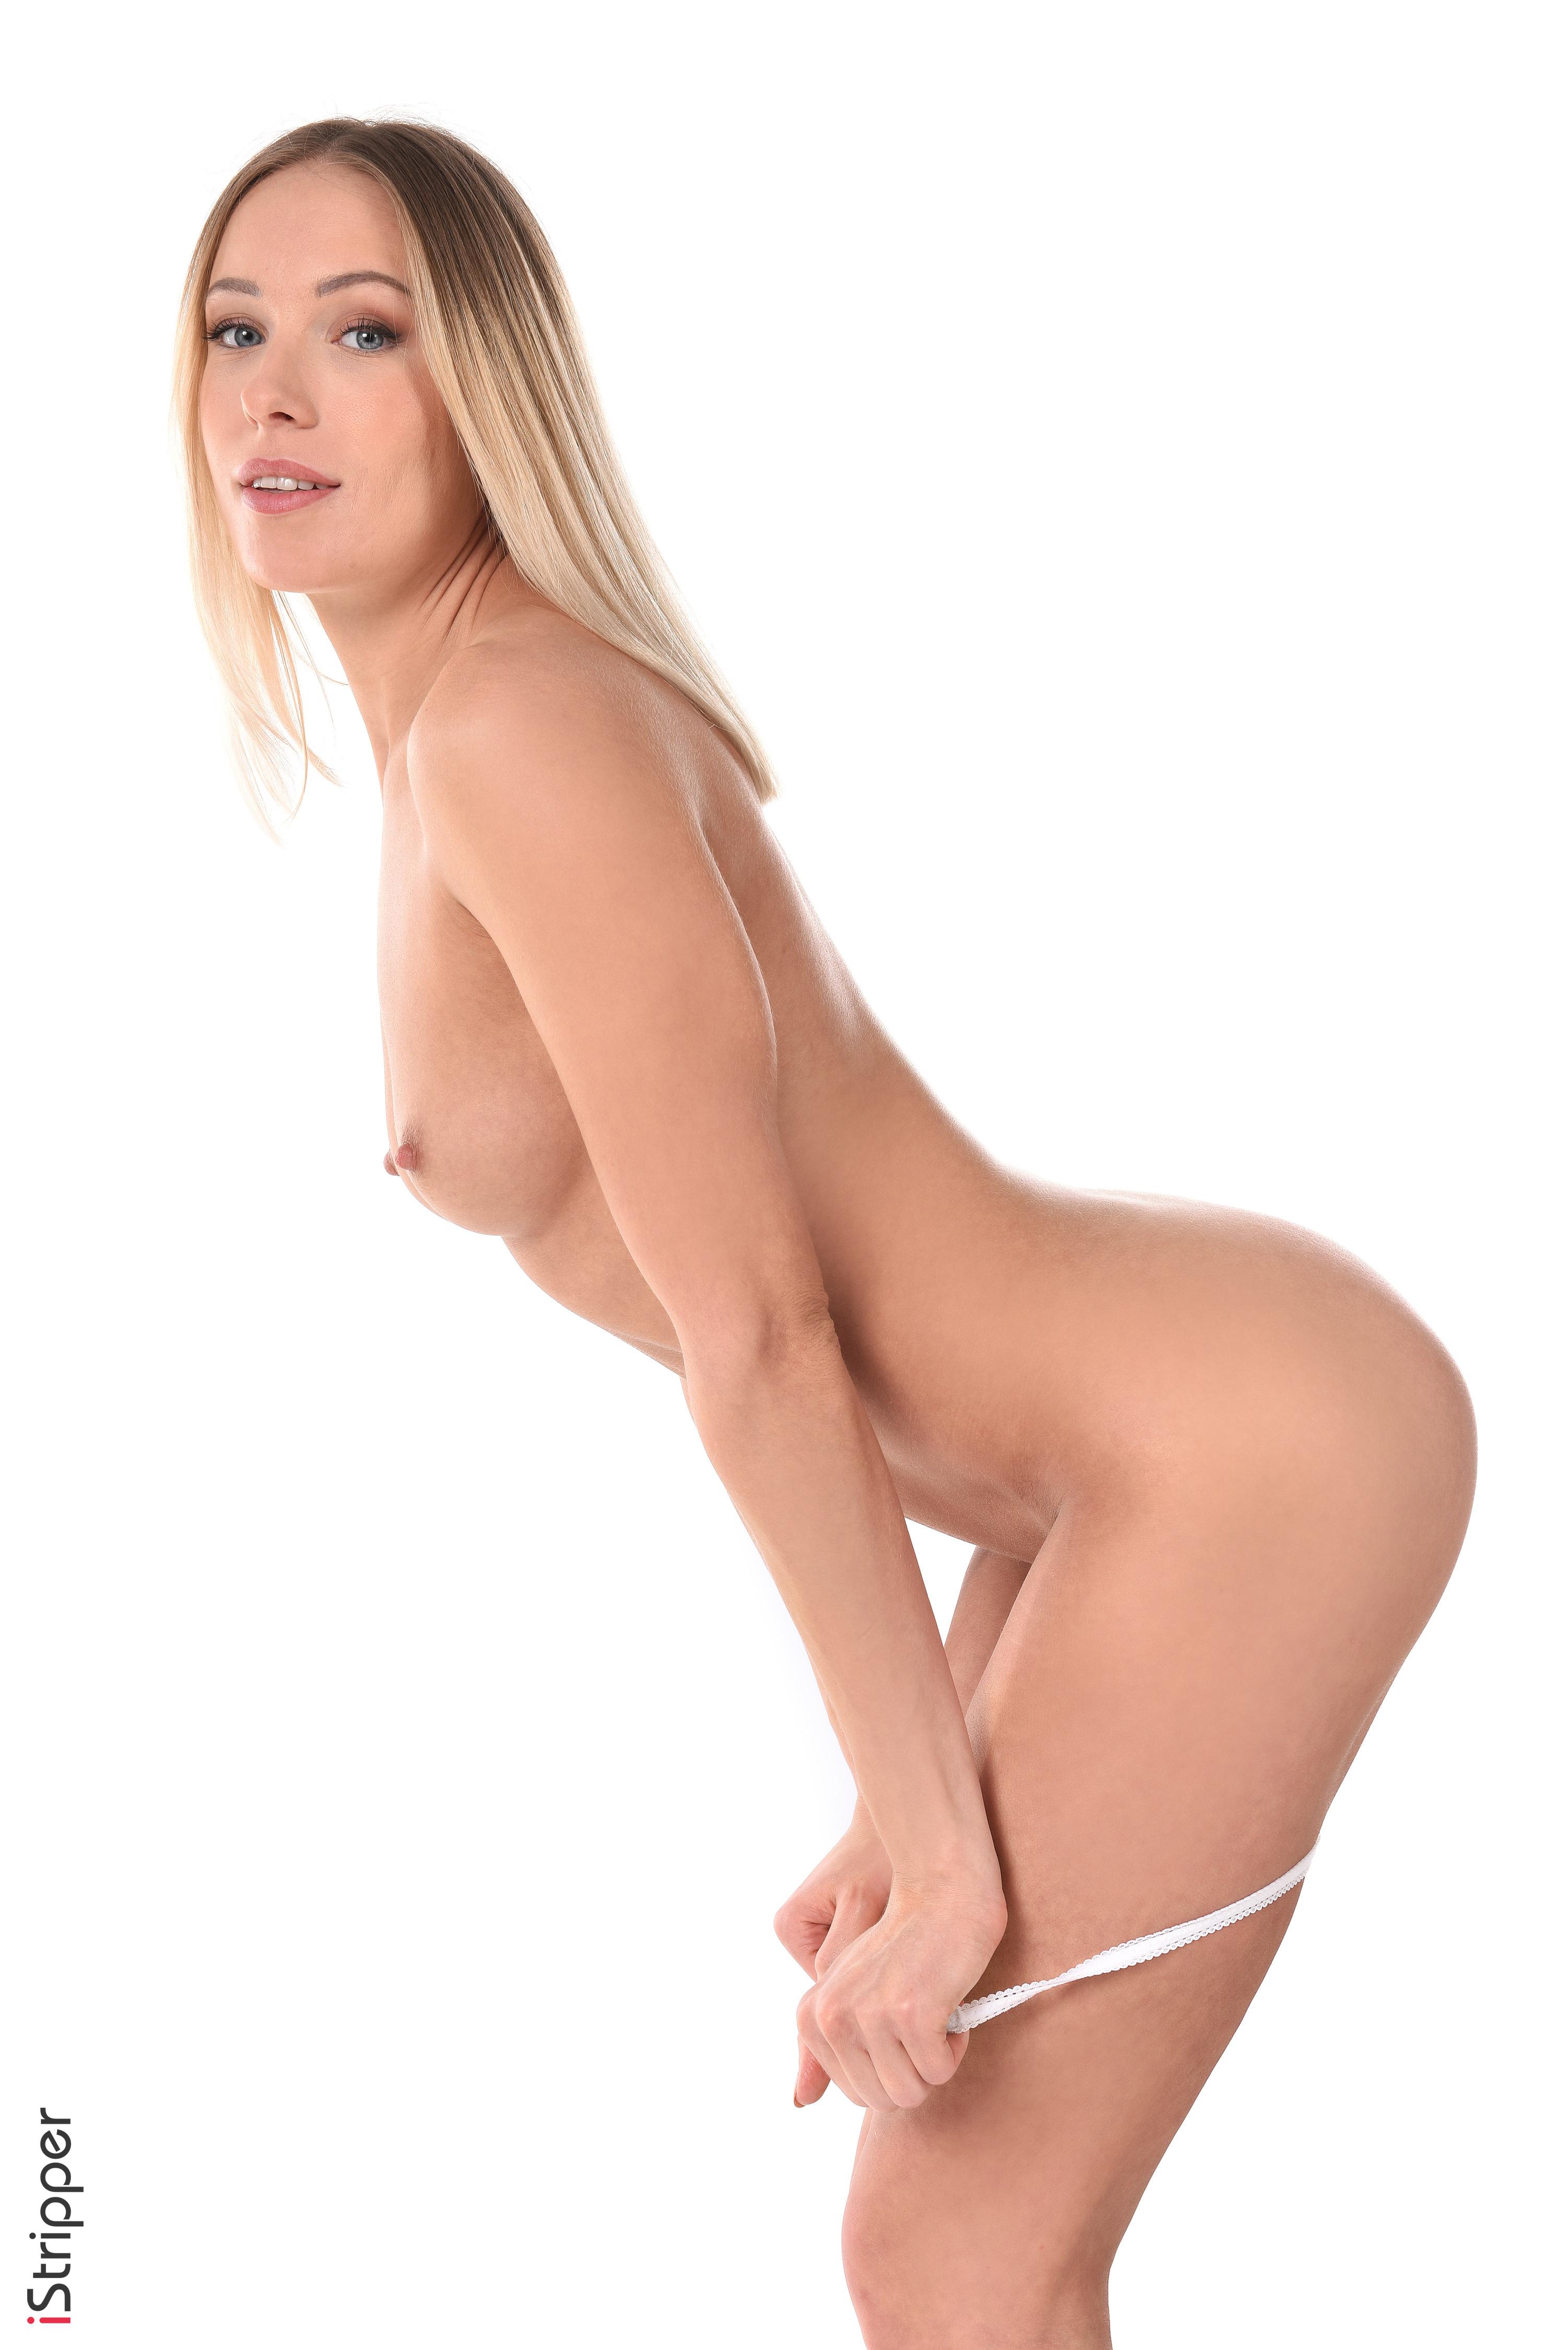 free nude girls wallpaper